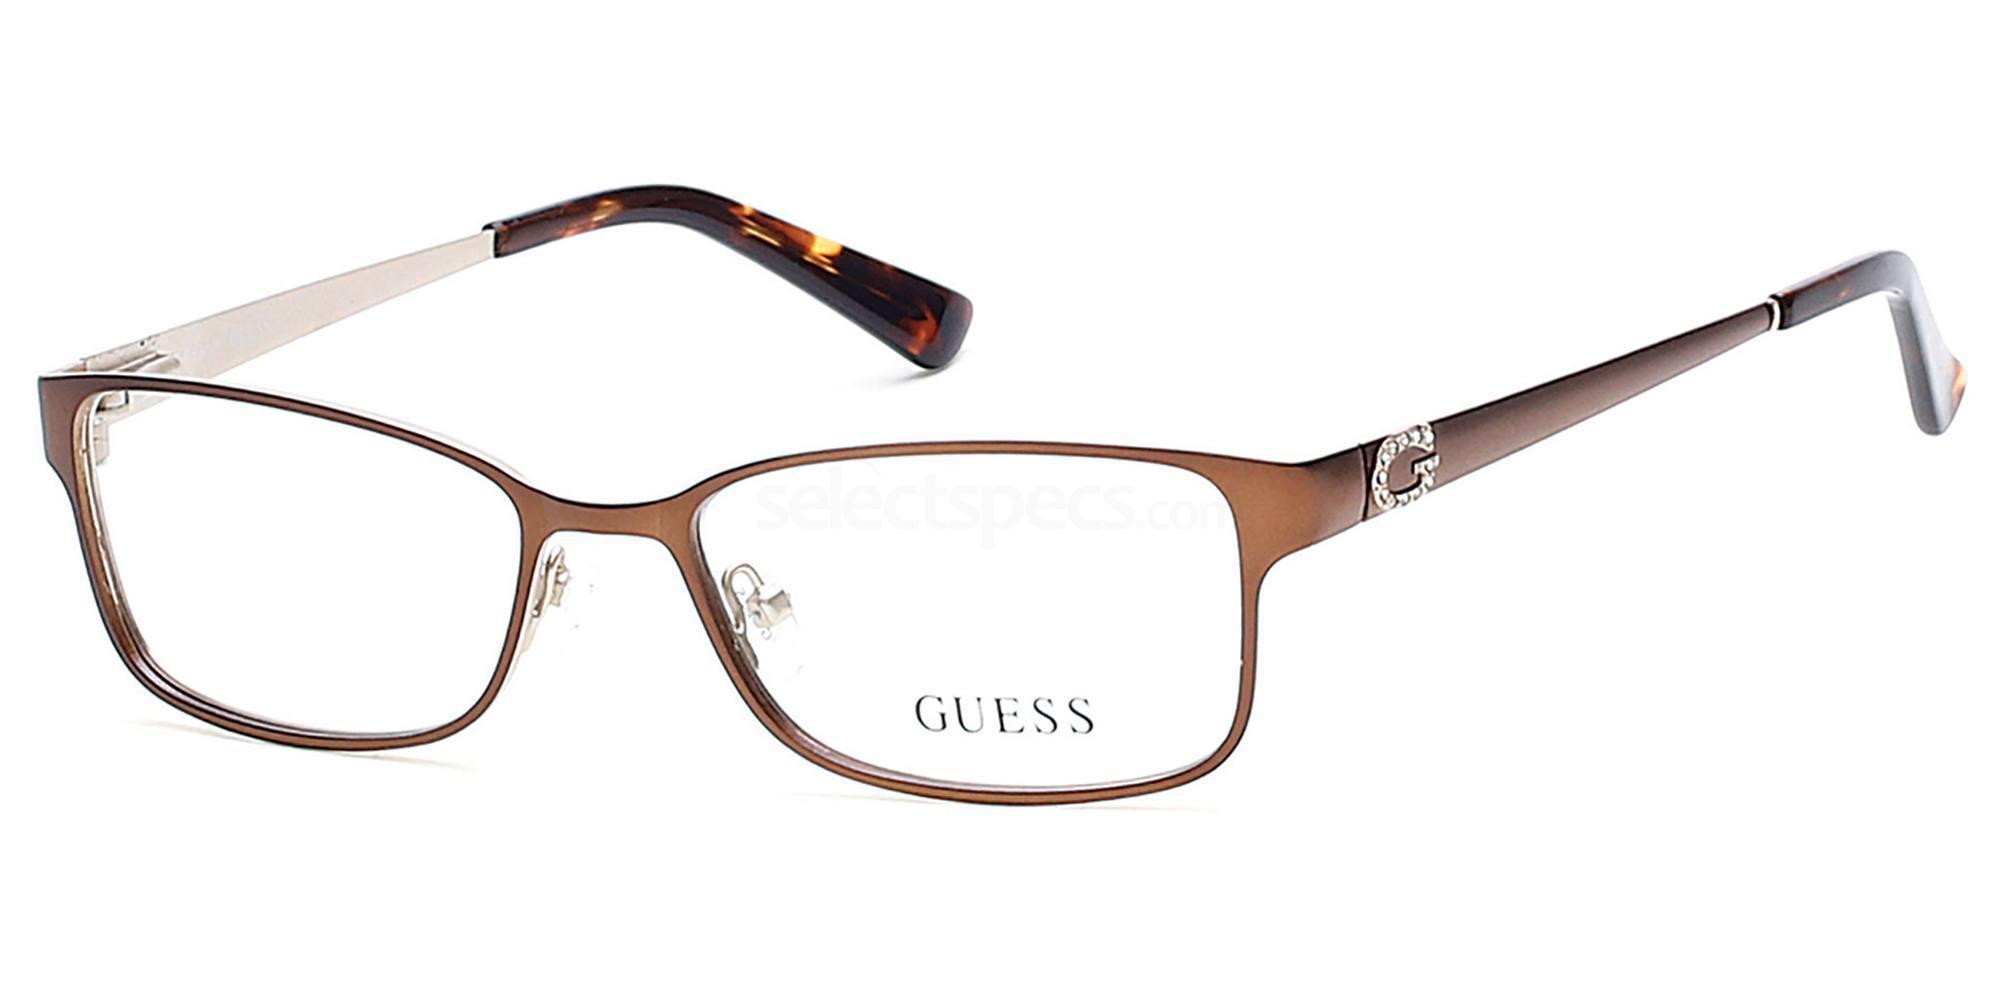 049 GU2568 Glasses, Guess